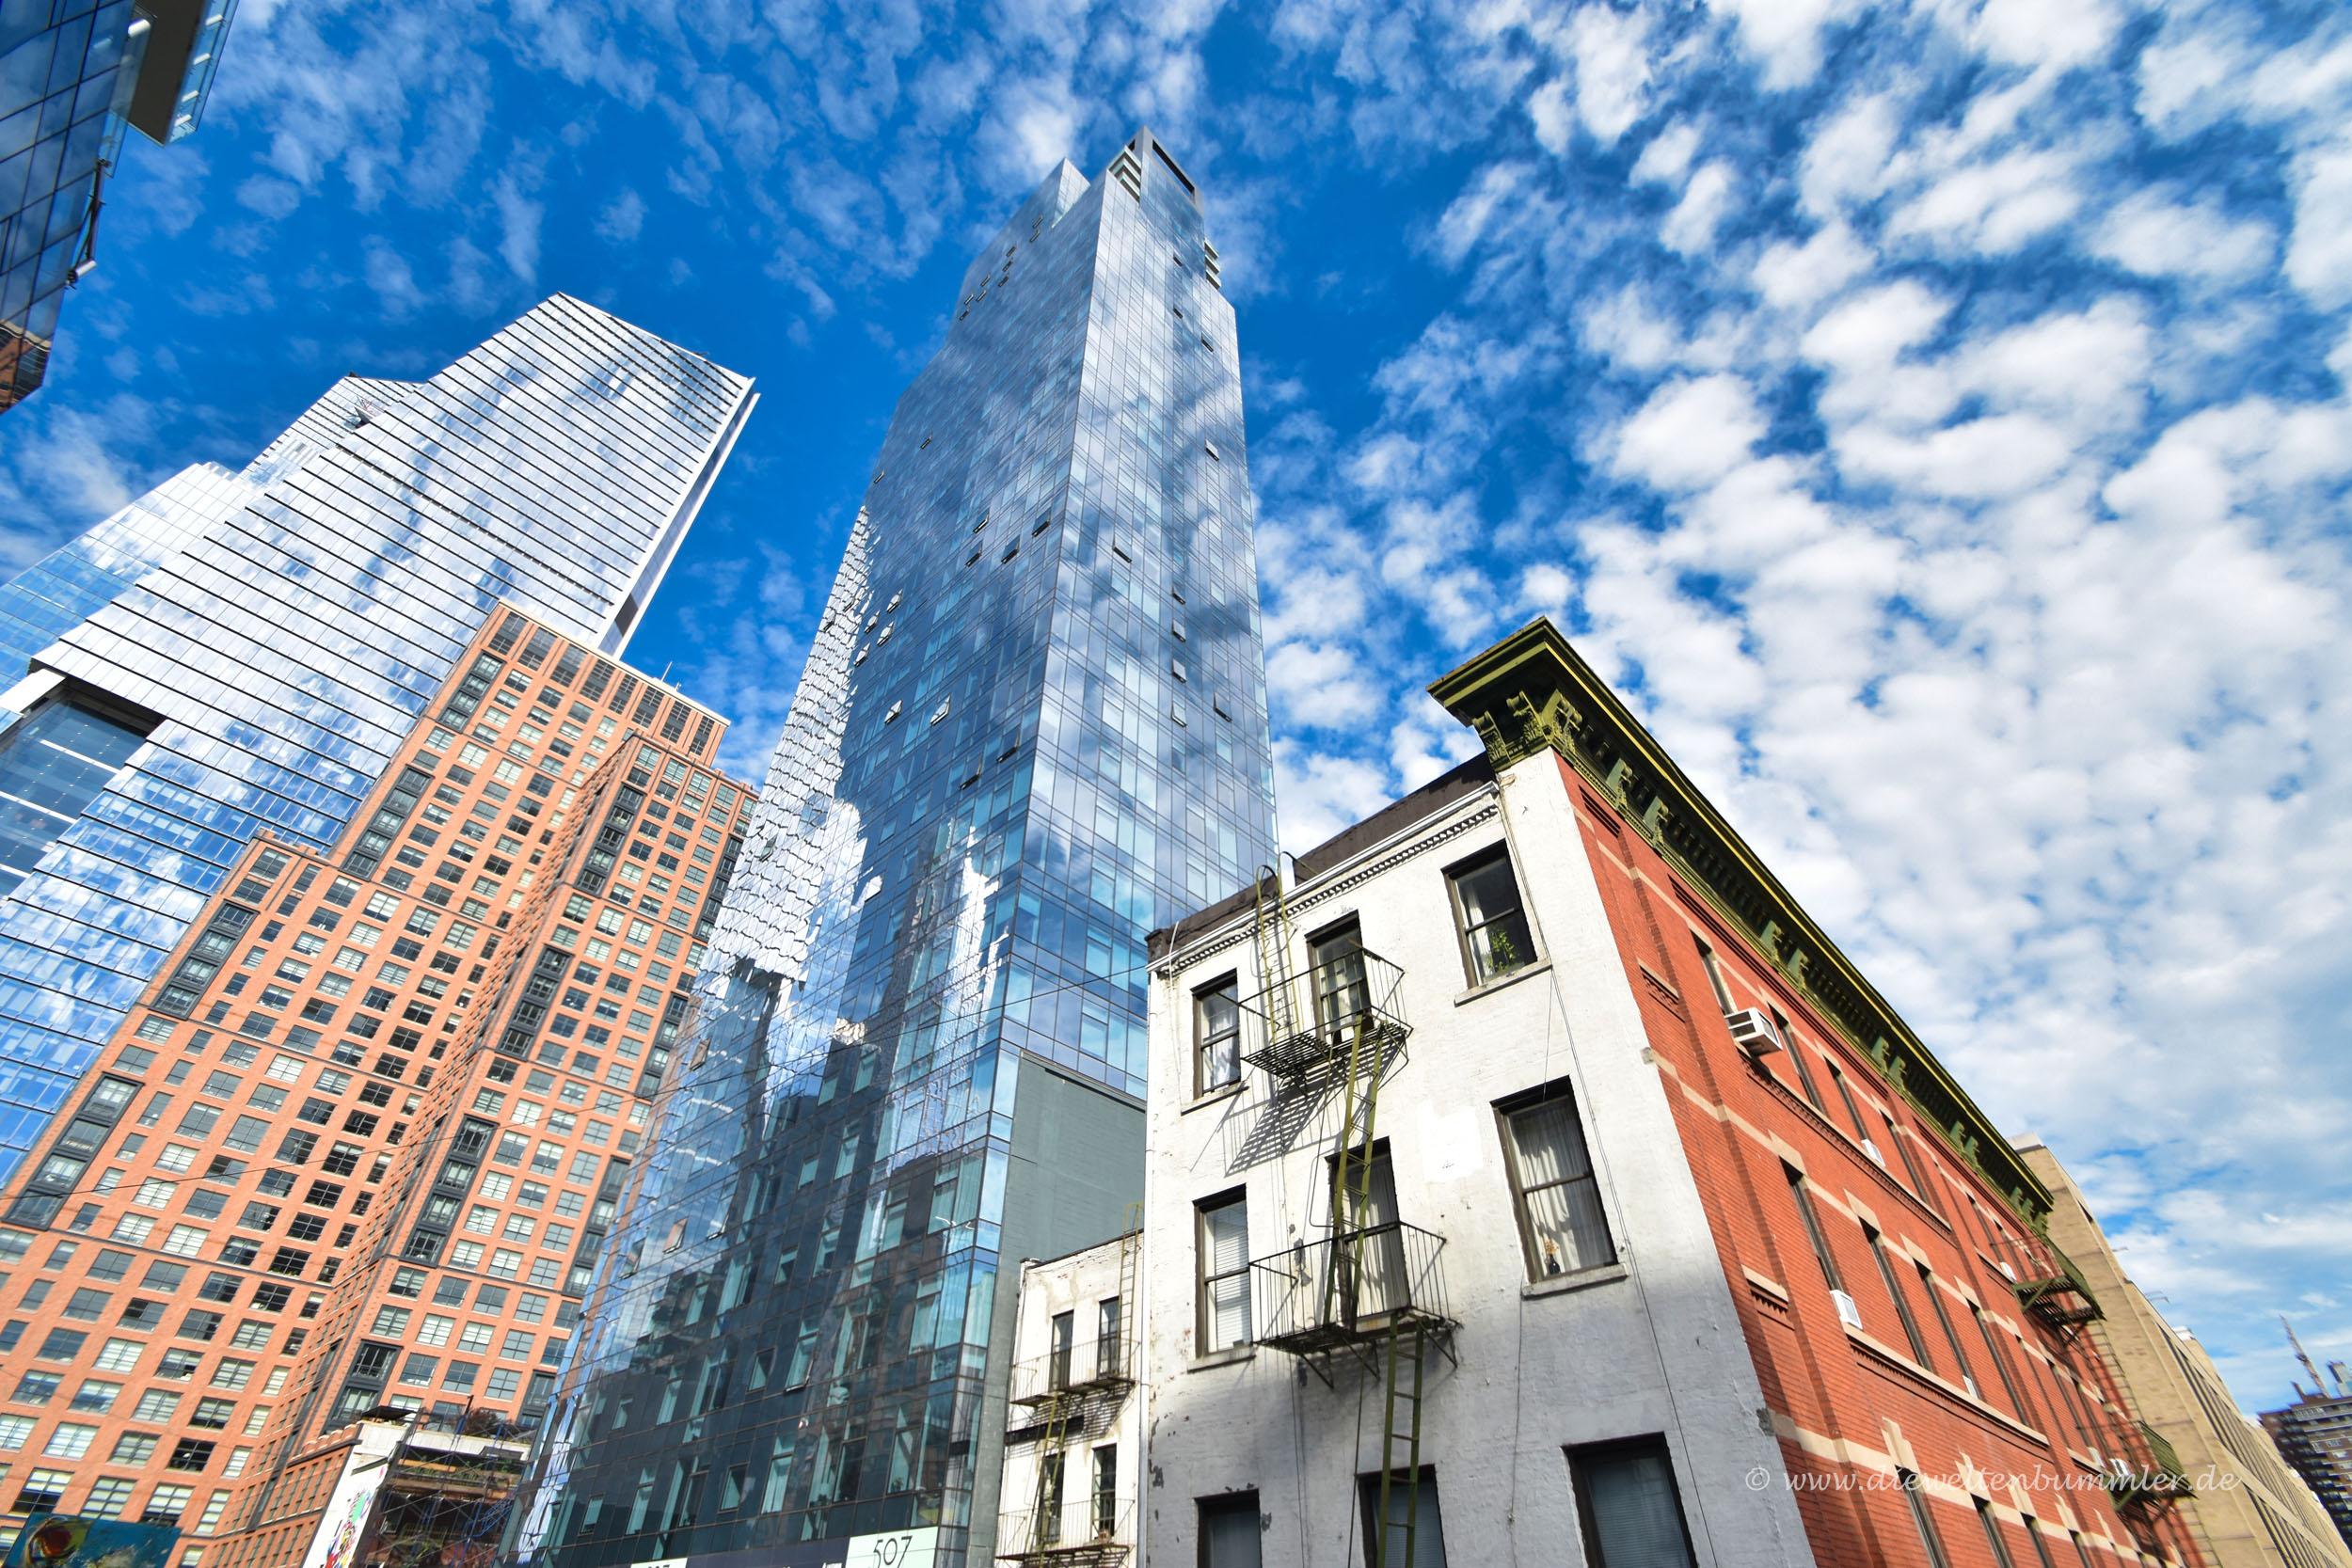 Hochhauskulisse in New York